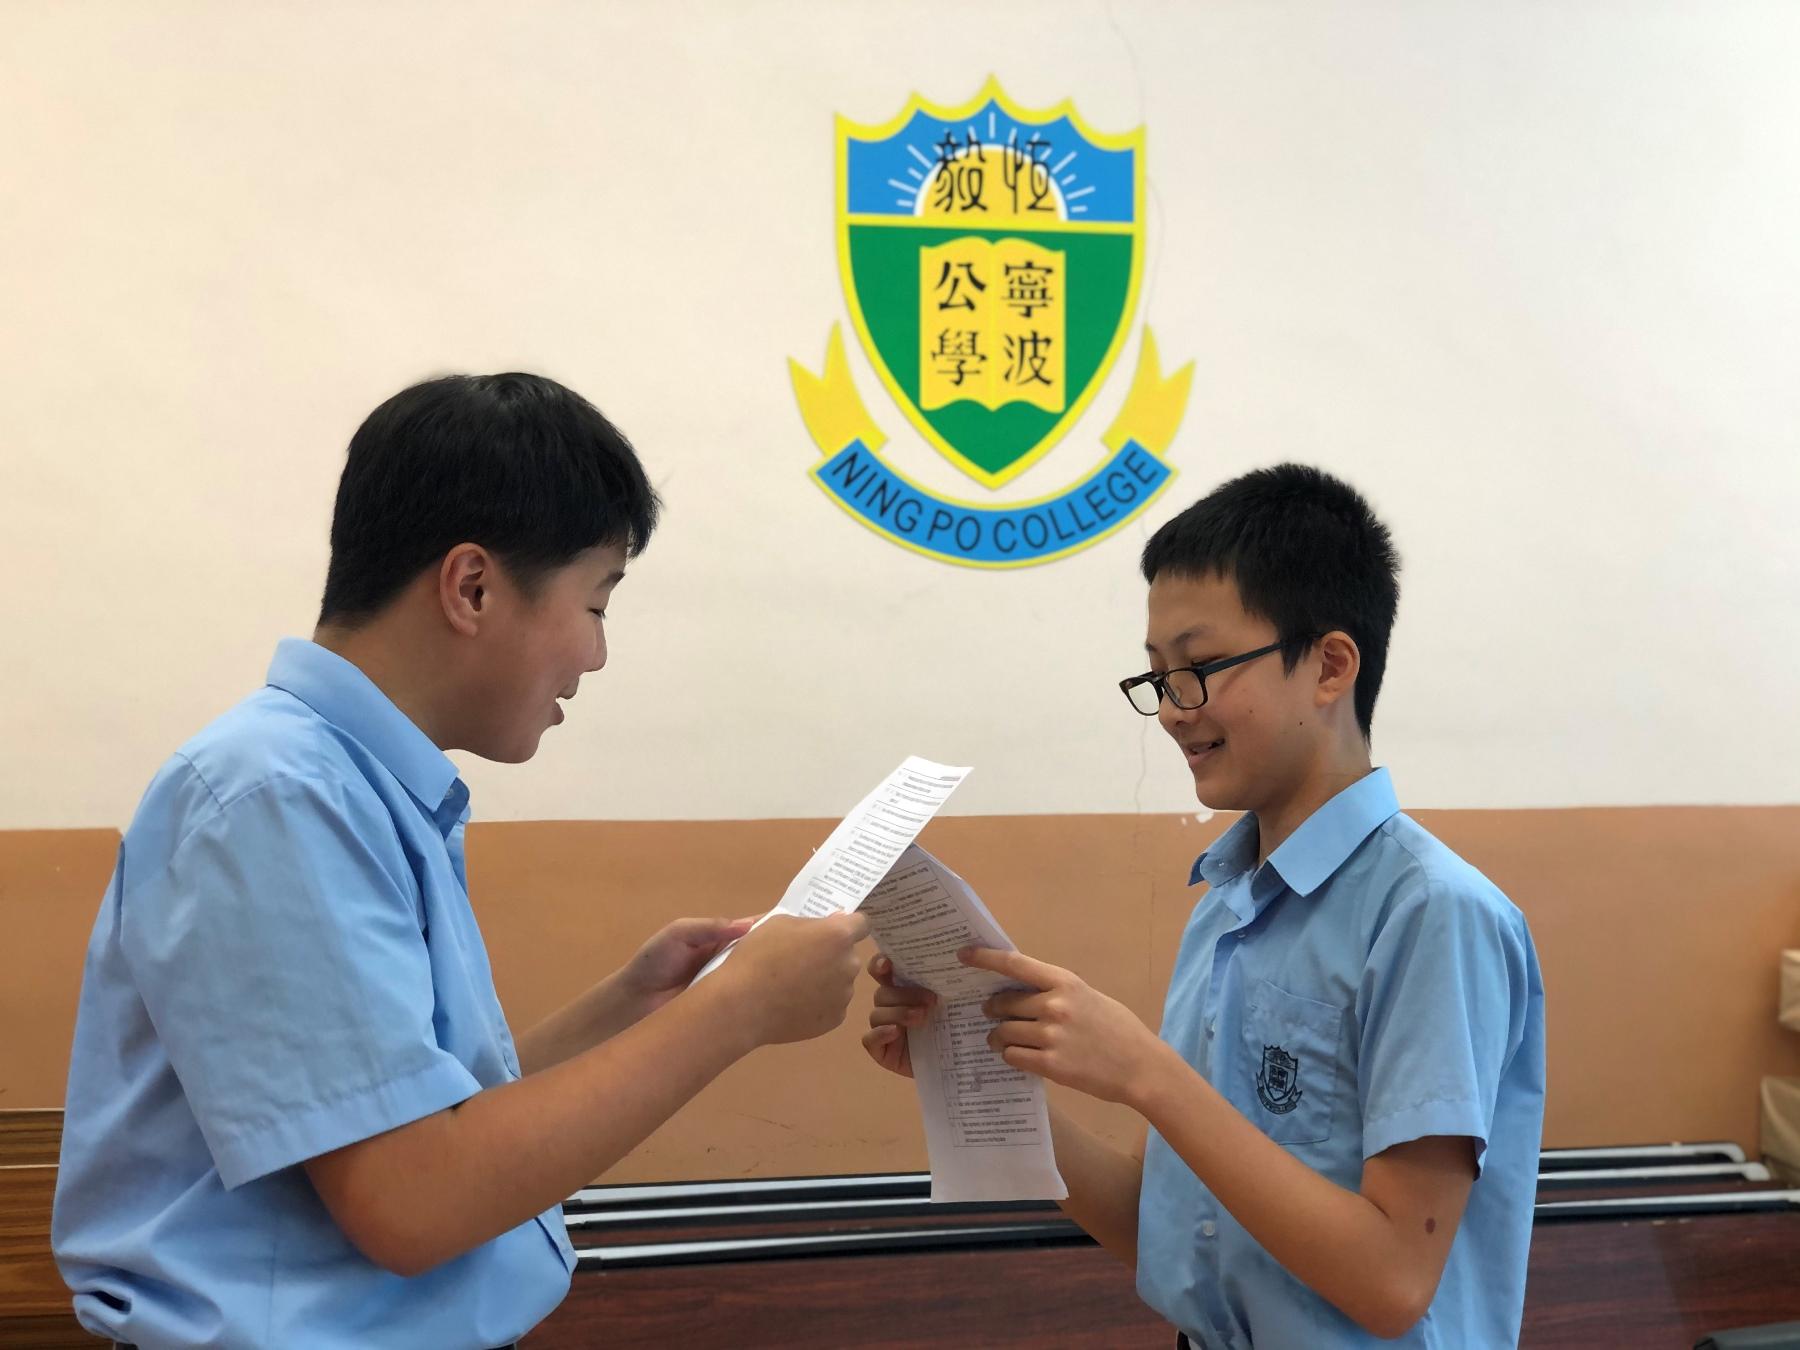 https://www.npc.edu.hk/sites/default/files/img_0078.jpg